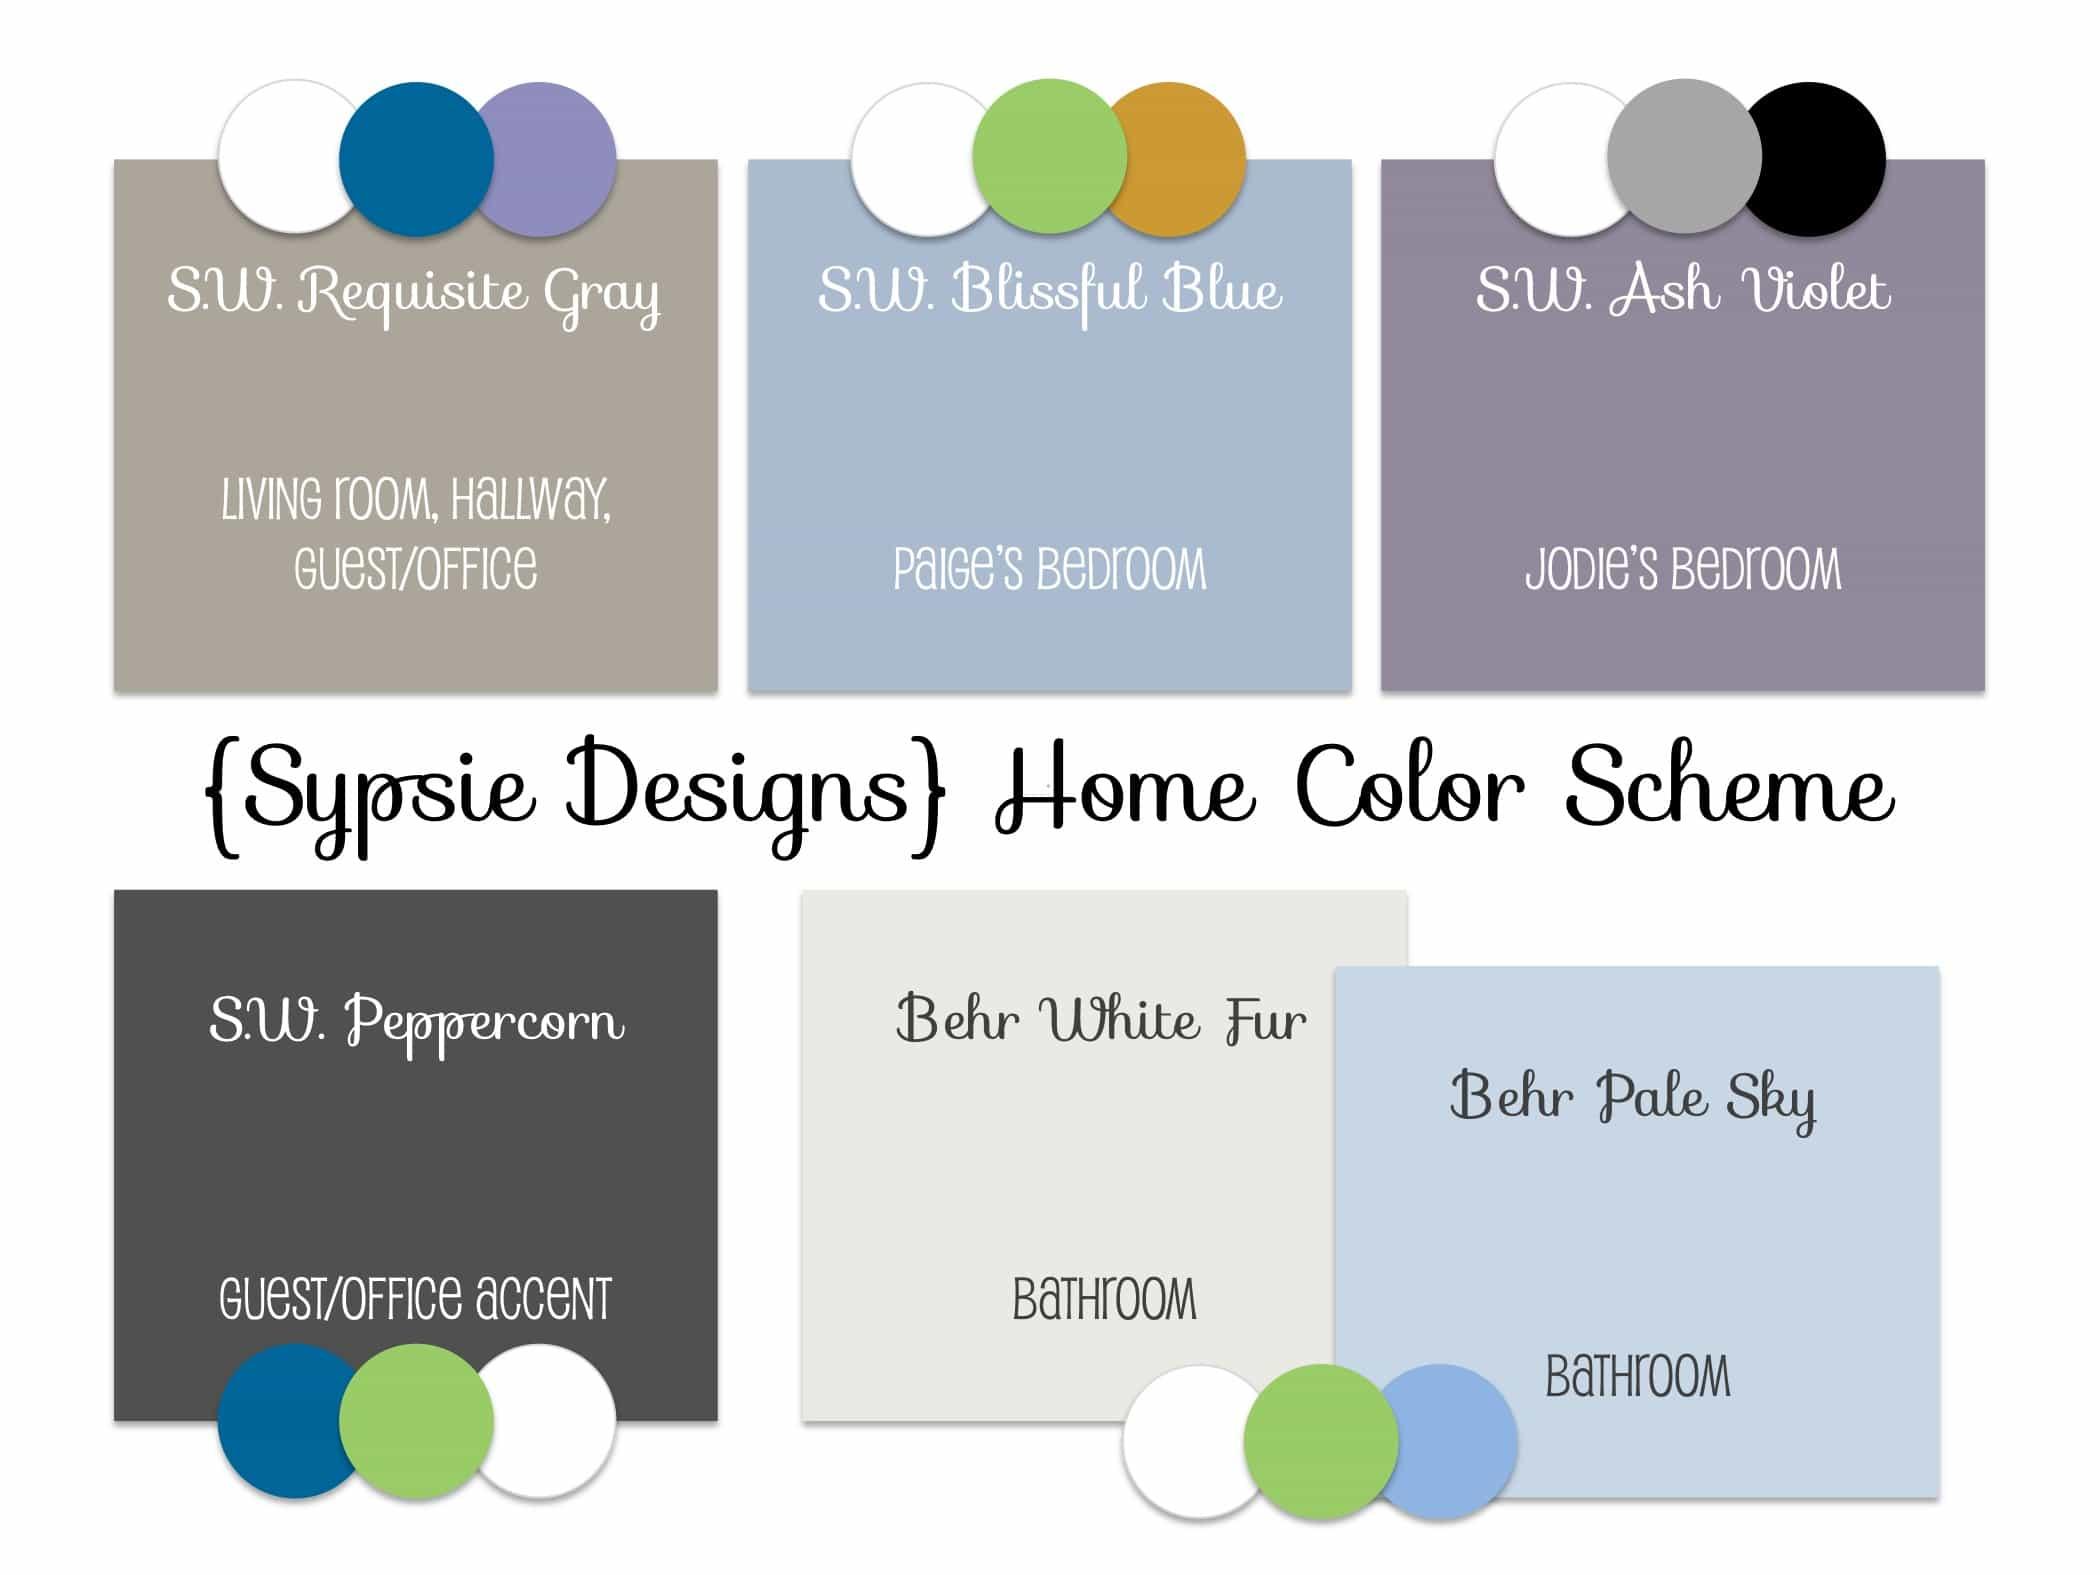 Home Color Scheme